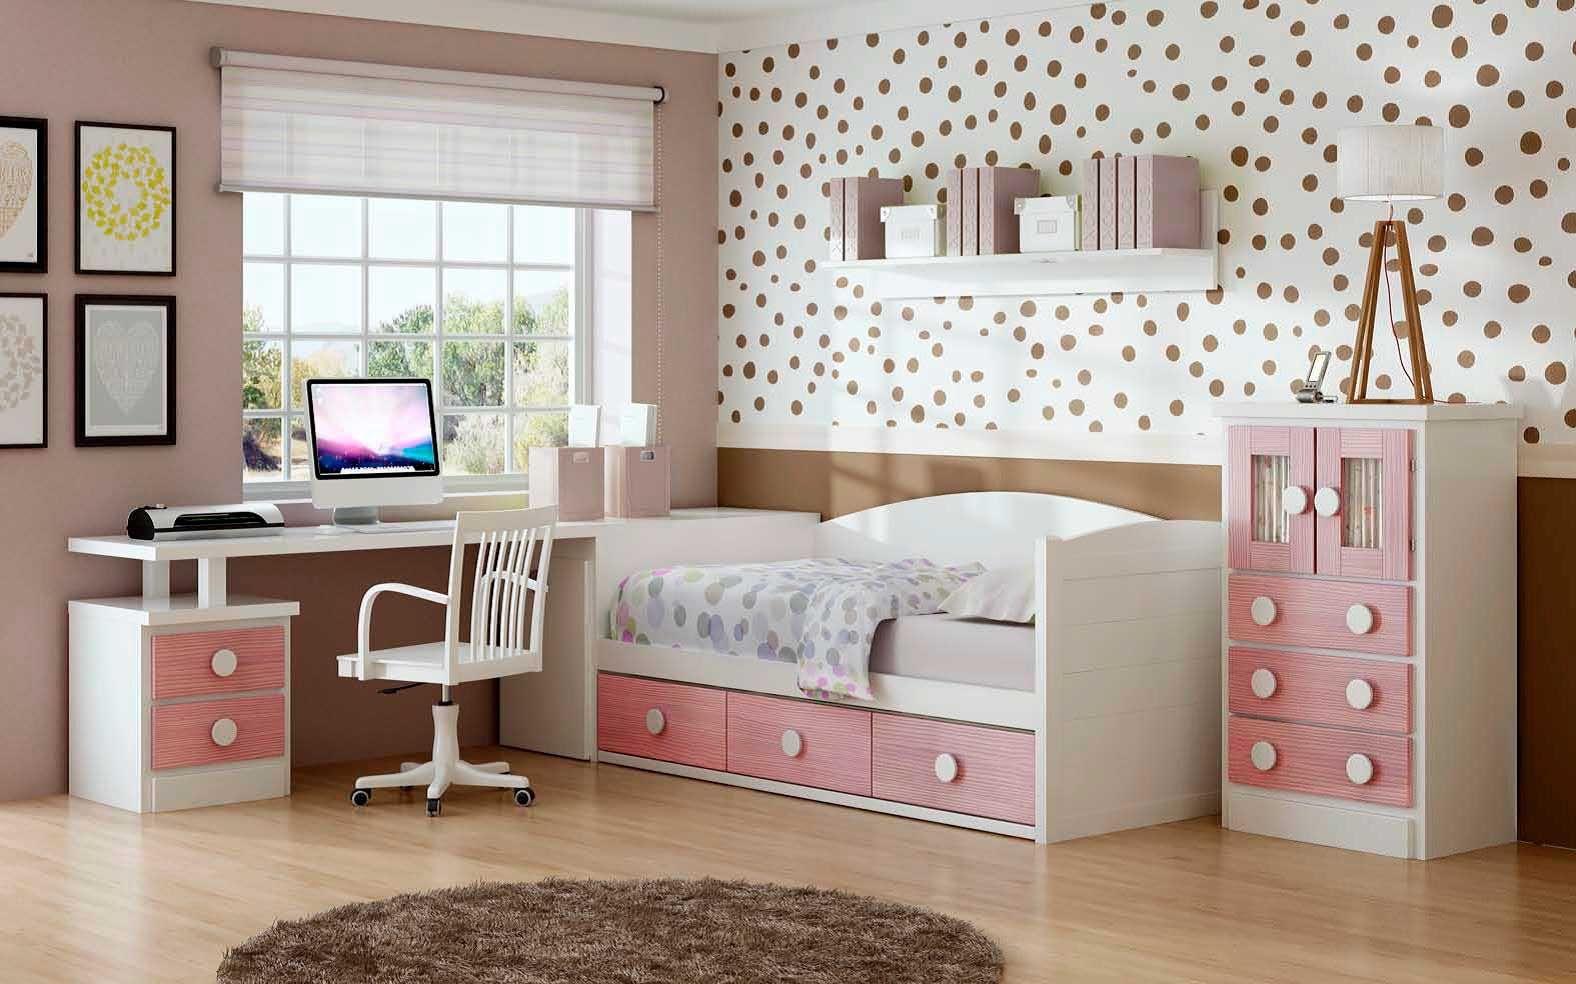 Muebles juveniles pino macizo buscar con google nenes como decorar tu habitacion - Decorar habitacion infantil ...